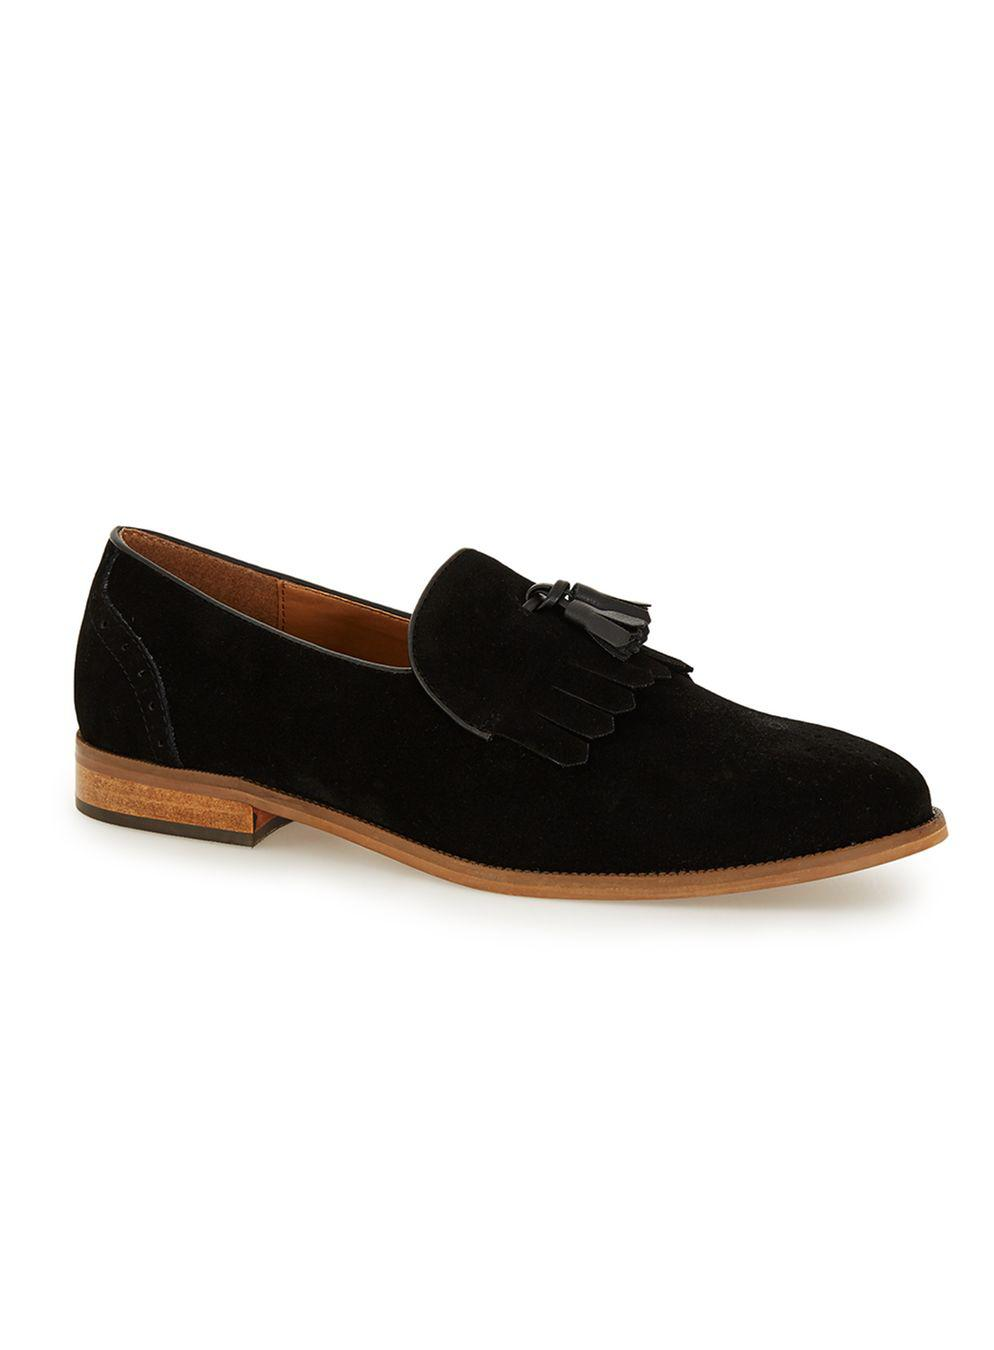 5110a554034 Lyst - TOPMAN Black Faux Suede Fringe Loafers in Black for Men